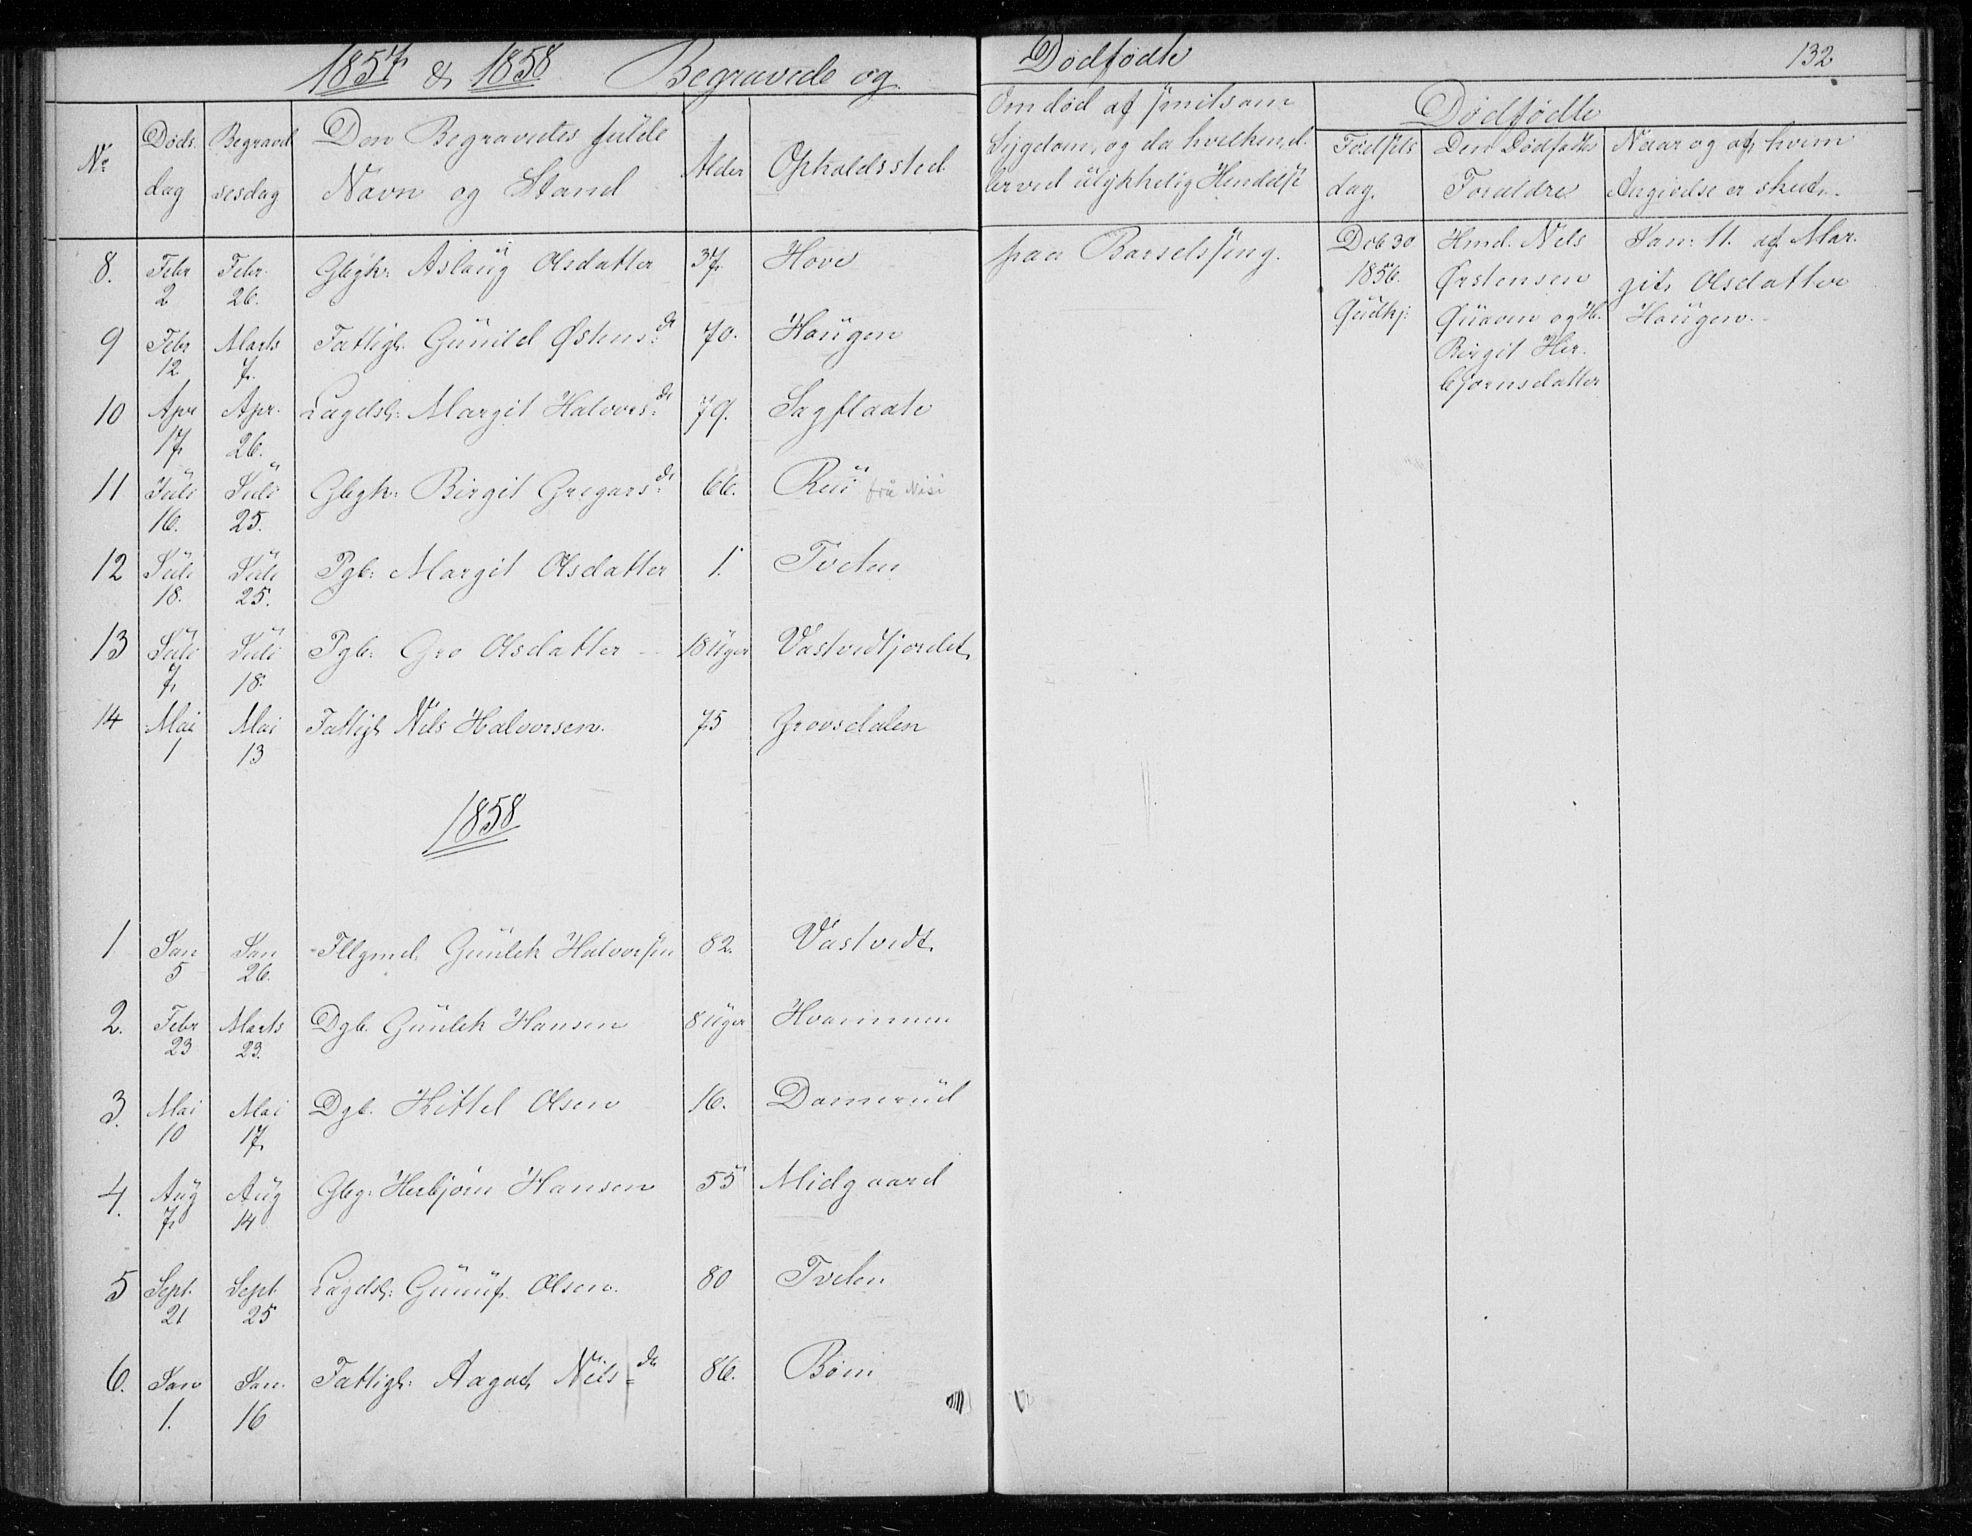 SAKO, Gransherad kirkebøker, F/Fb/L0003: Ministerialbok nr. II 3, 1844-1859, s. 132